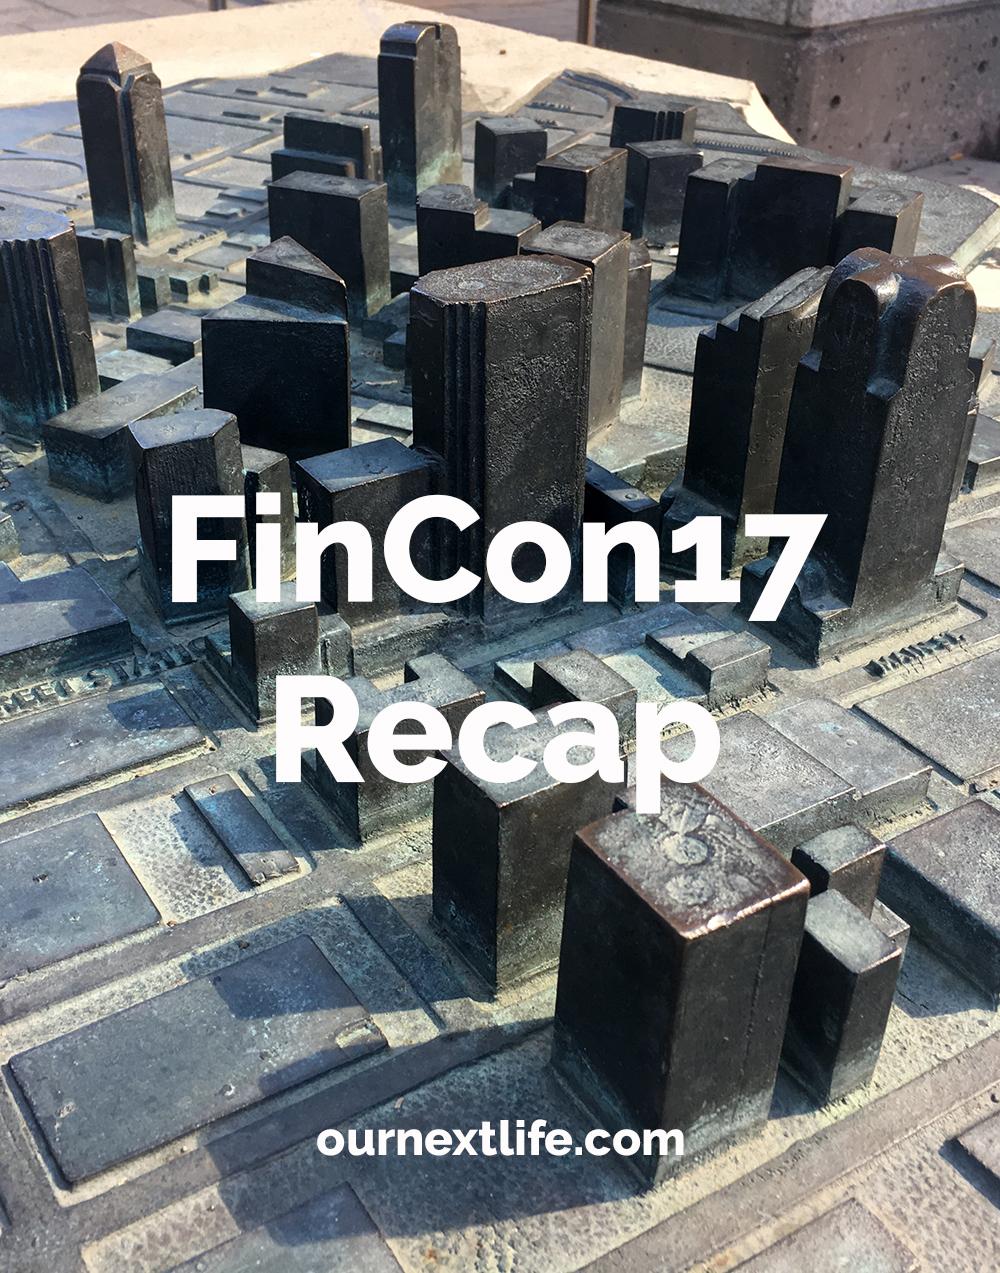 FinCon17 recap, FinCon Expo, Financial Bloggers Conference, Our Next Life, ournextlife.com